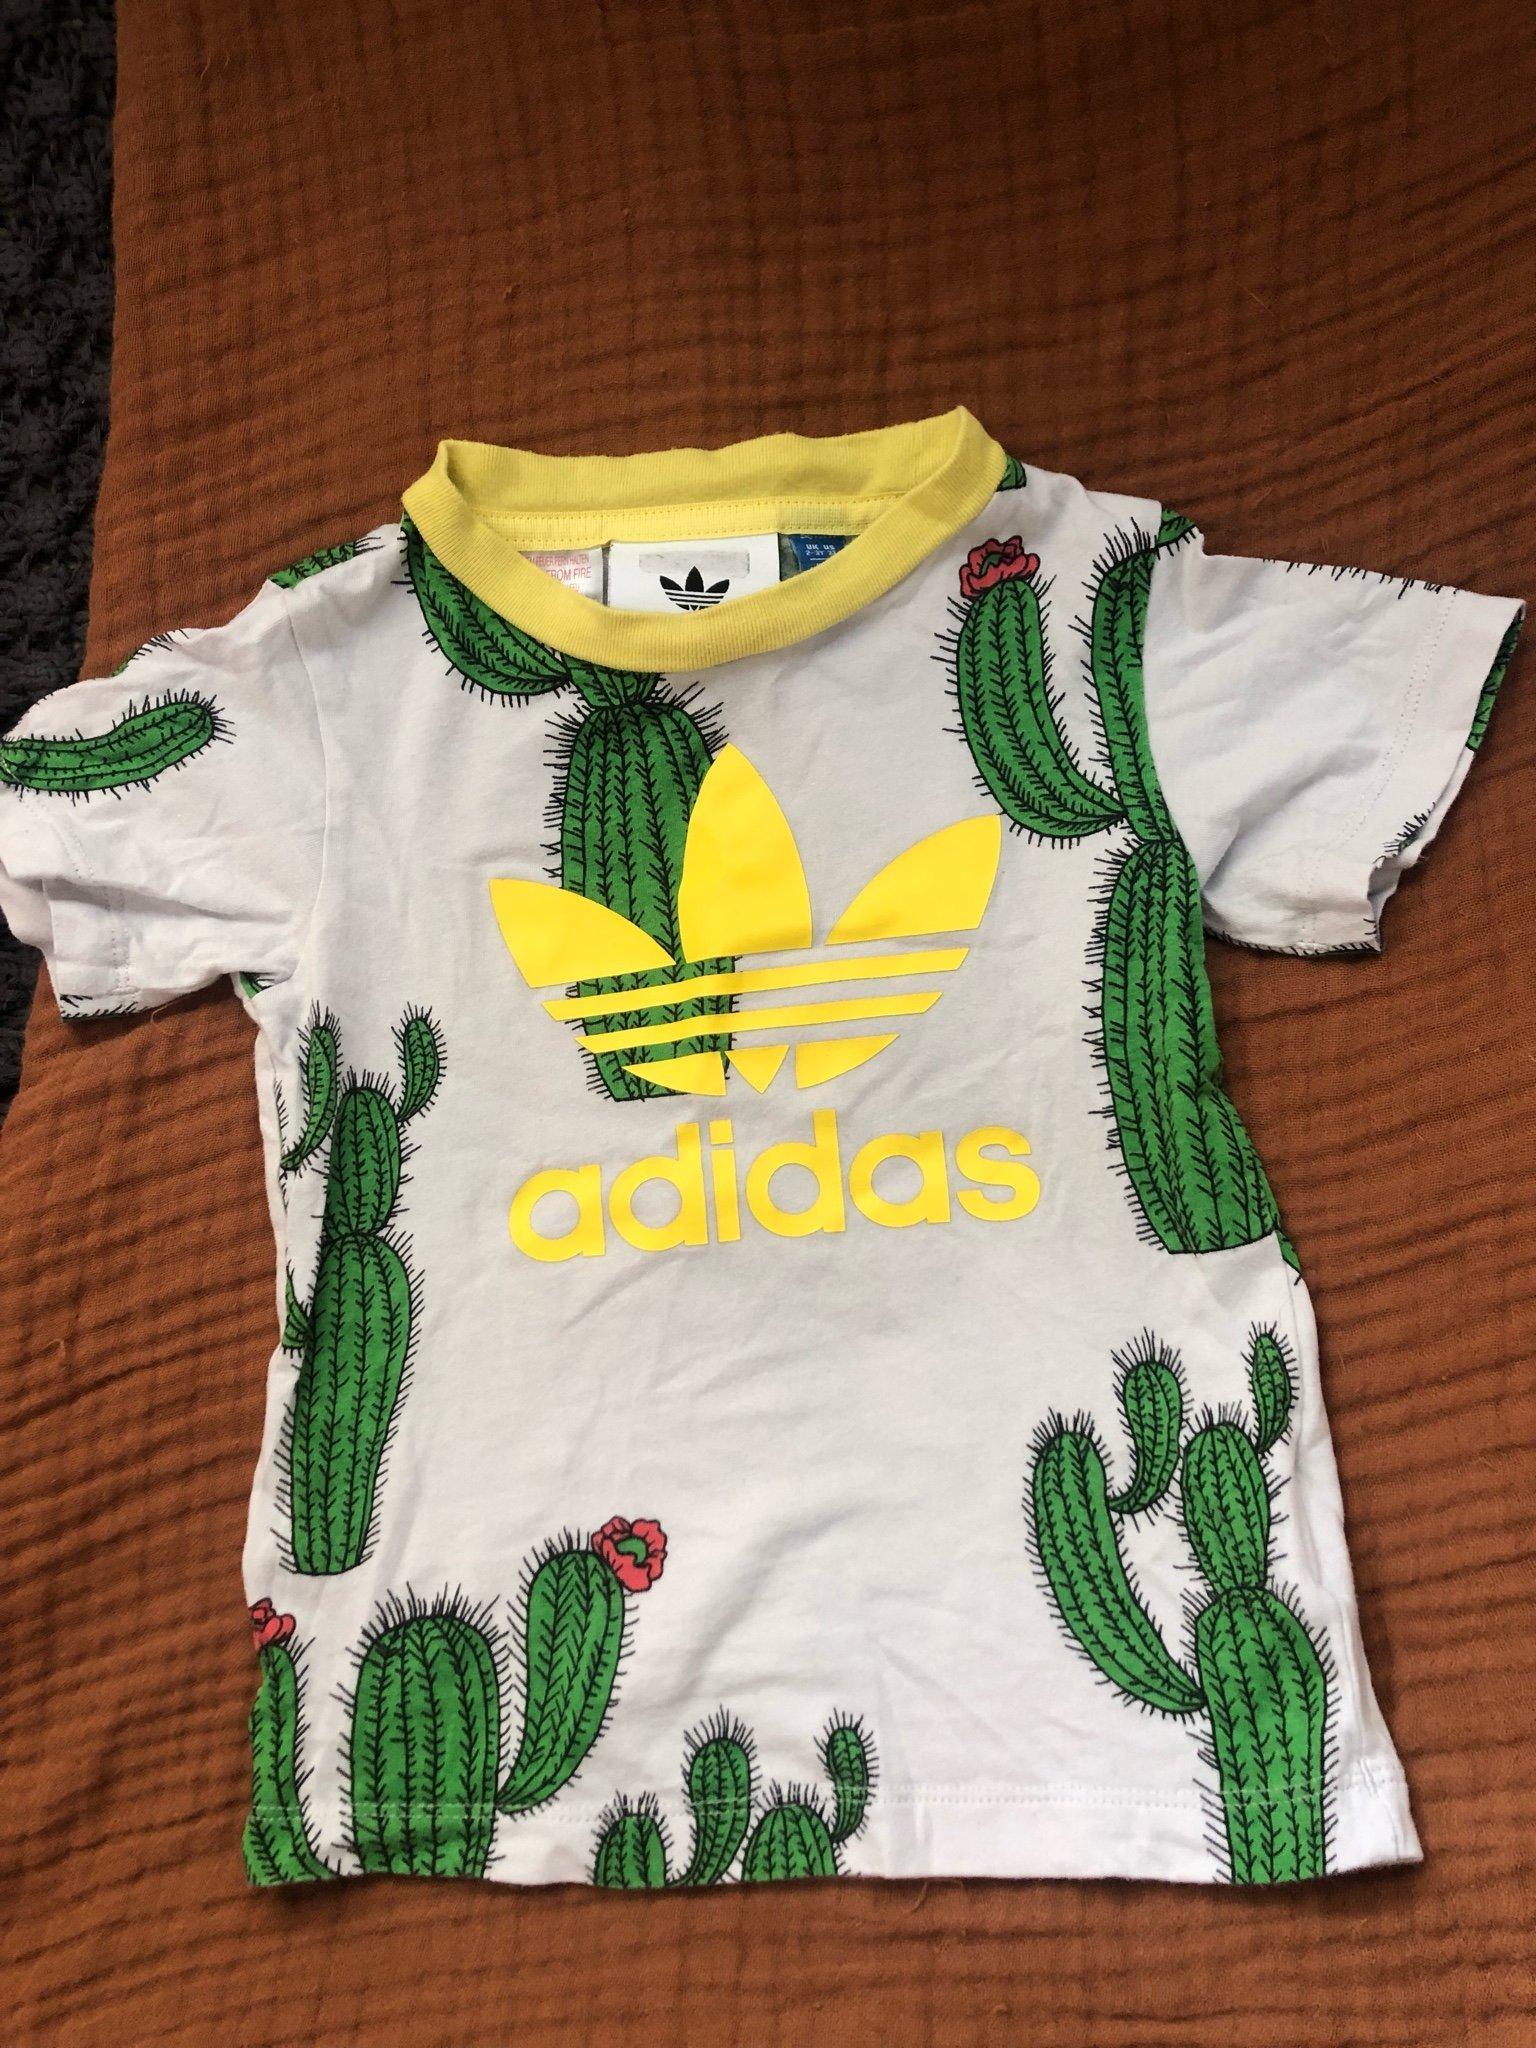 Mini Rodini Adidas Cactus 98 358839652 ᐈ Kop Pa Tradera